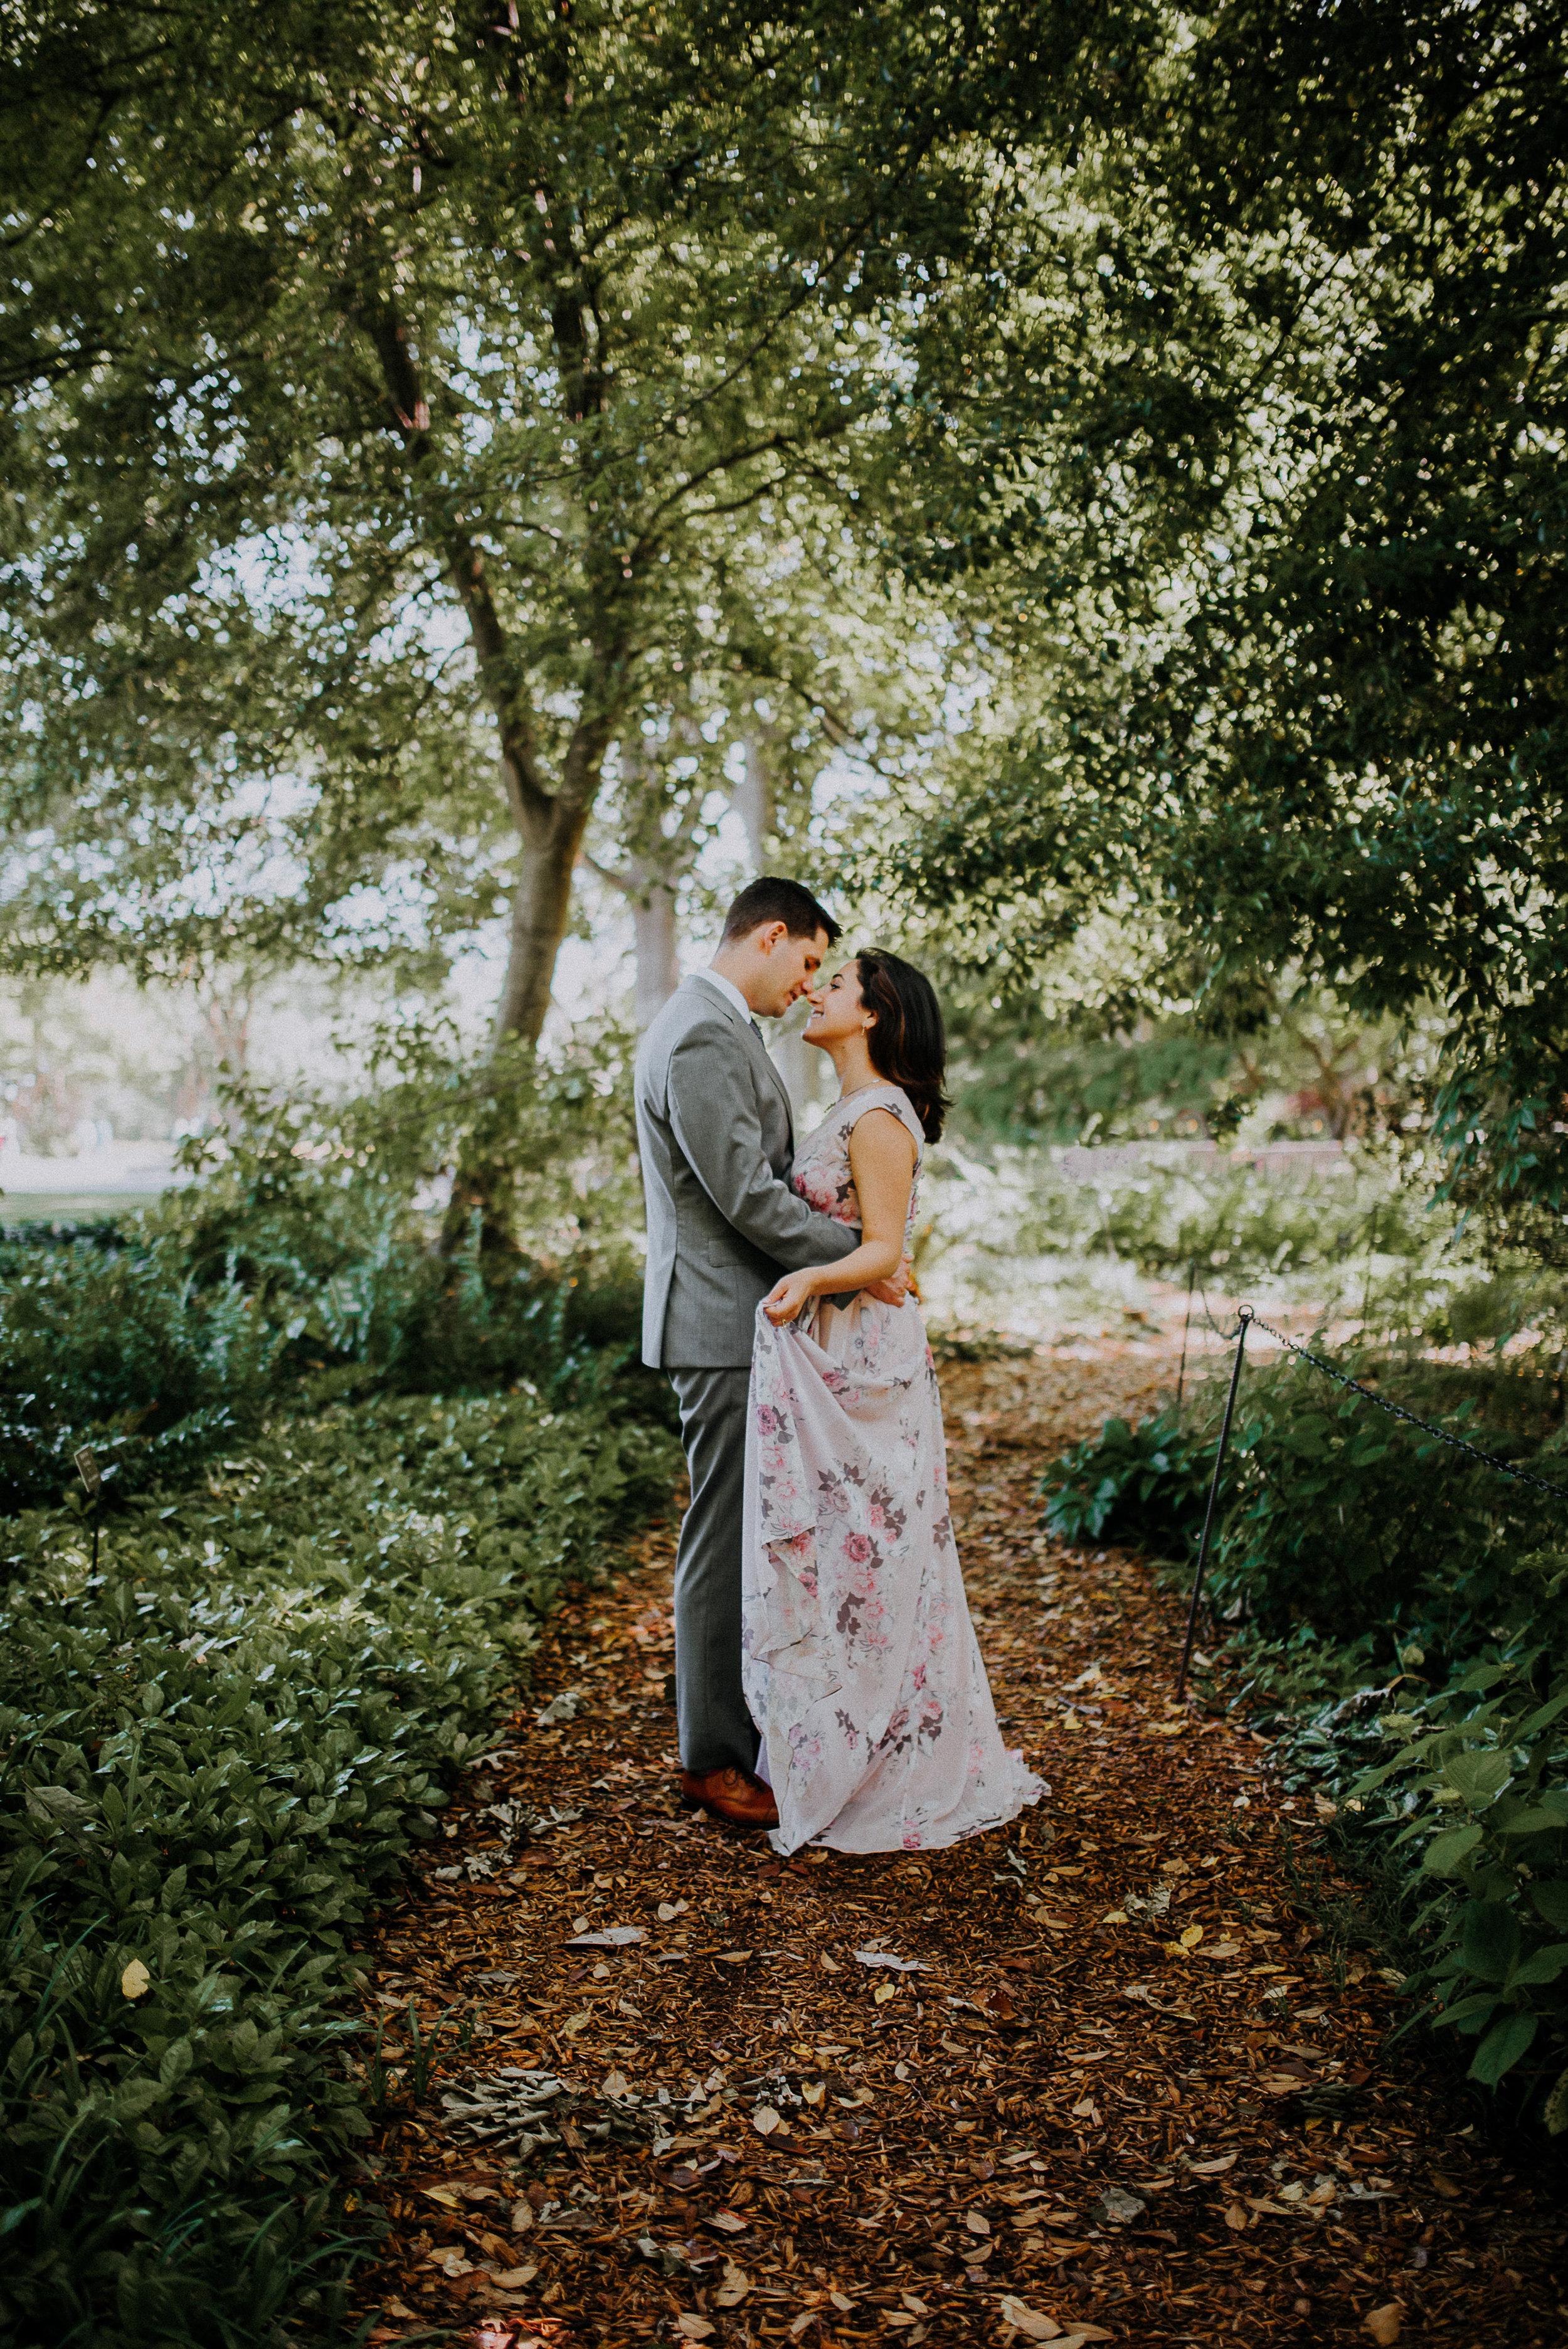 Dallas-fort-worth-wedding-photographer-dallas-arboretum-intimate-wedding-dallas-texas-40